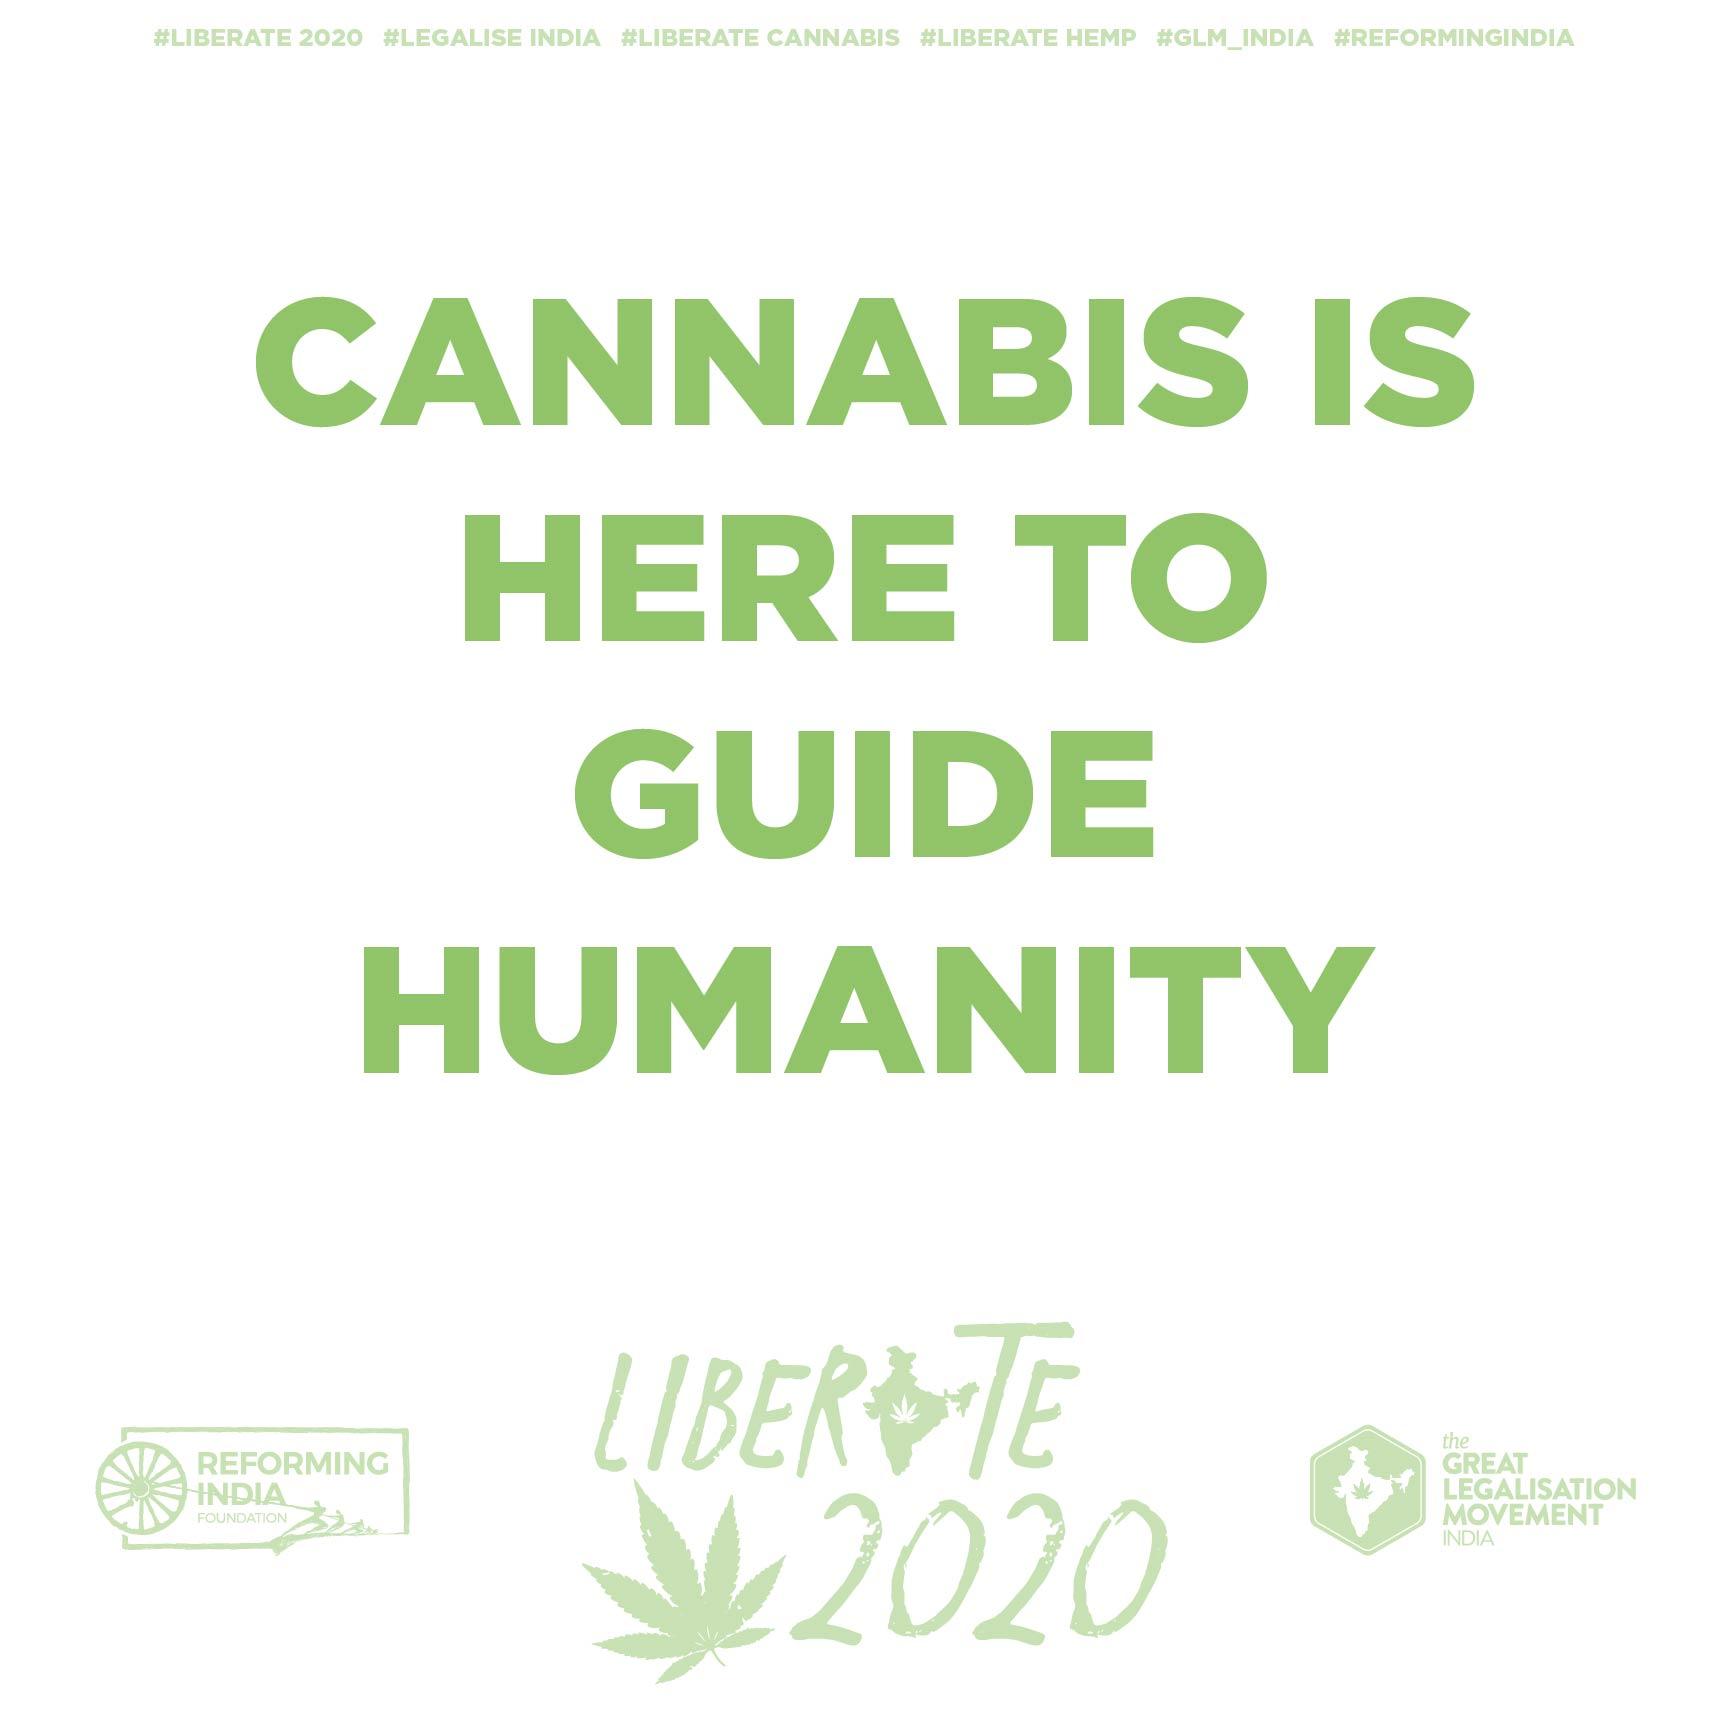 cannabisArtboard 1 copy 7-50.jpg